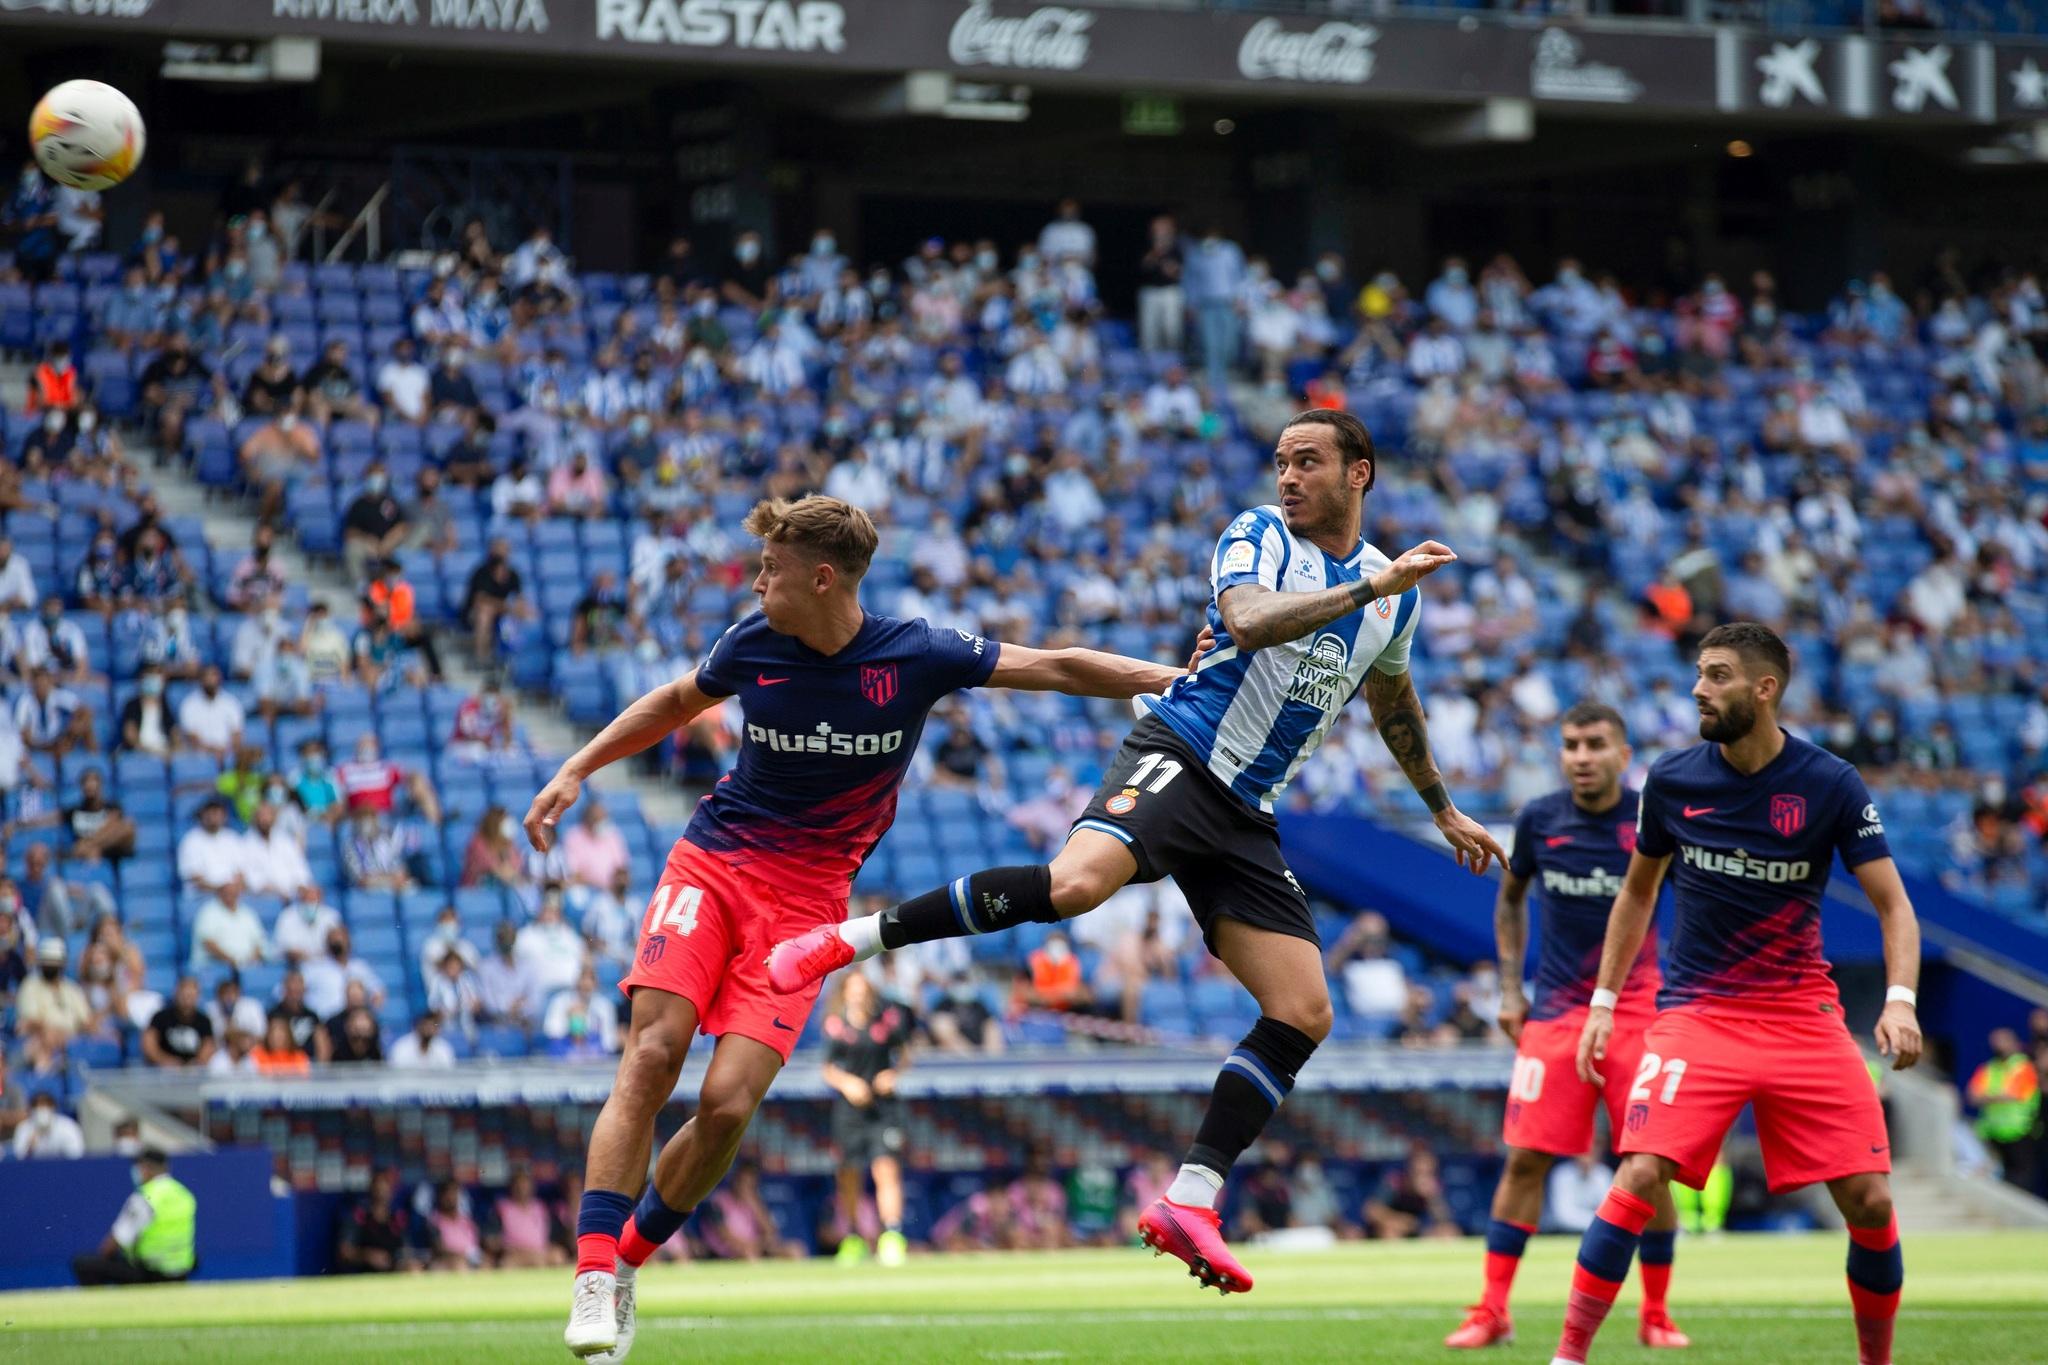 GRAF8811. CORNELLË DE LLOBREGAT, 12/09/2021.- El delantero del RCD Espanyol Raúl lt;HIT gt;Tomás lt;/HIT gt; (c) lt;HIT gt;marca lt;/HIT gt; el primer gol durante el partido de la cuarta jornada de la Liga de Primera División disputado entre el Espanyol y el lt;HIT gt;Atlético lt;/HIT gt; de Madrid, este domingo en el RCD Stadium de Cornellá. EFE/ Enric Fontcuberta